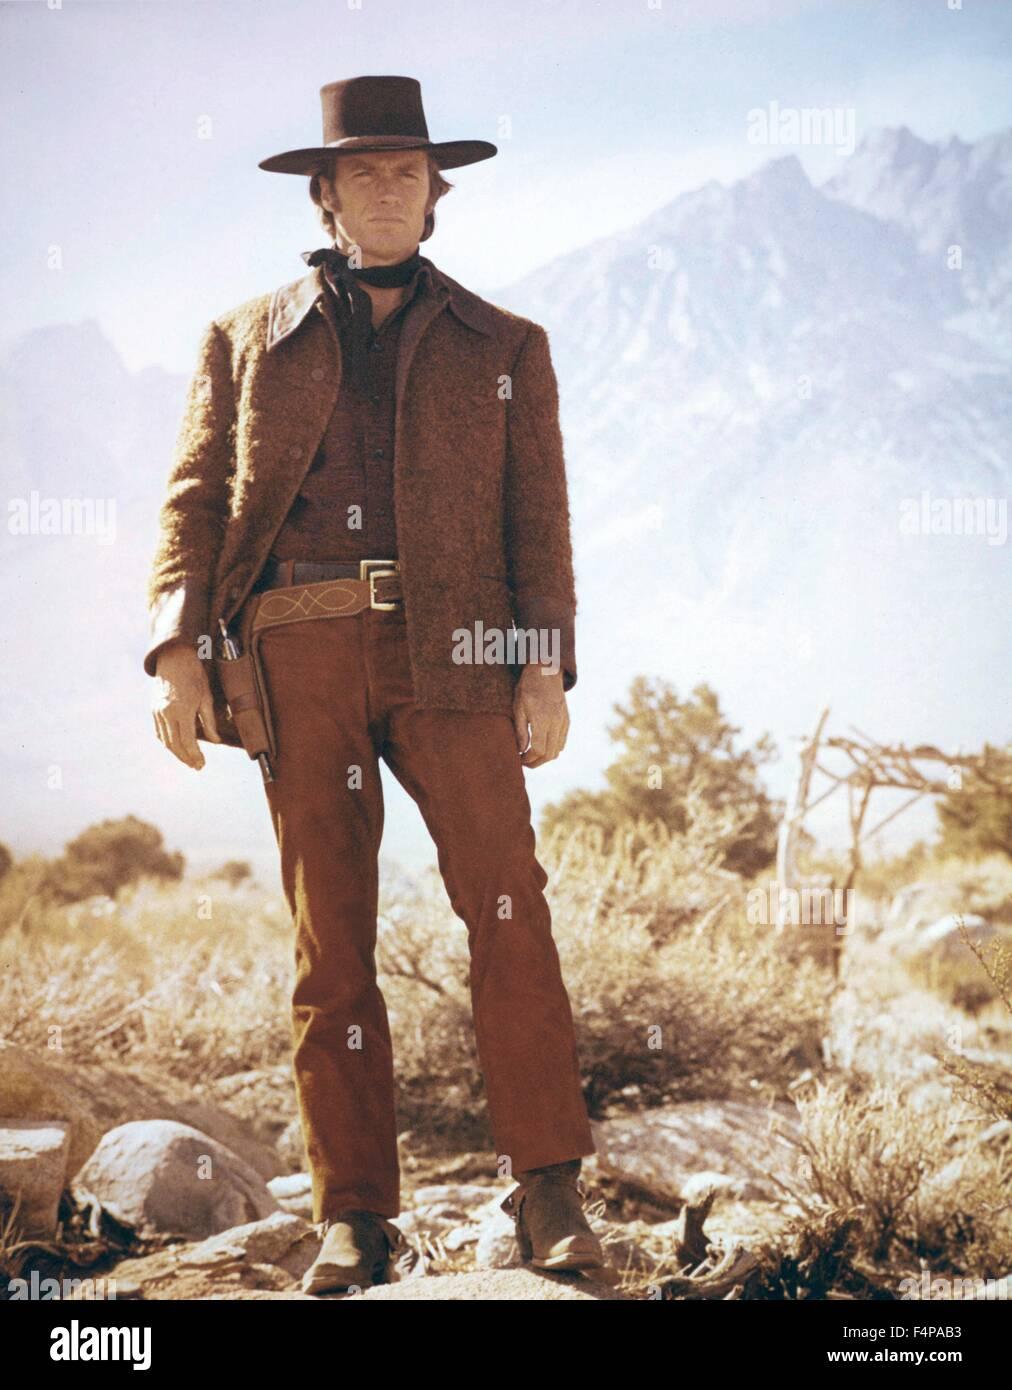 Clint Eastwood / Joe Kidd 1972 directed by John Sturges - Stock Image